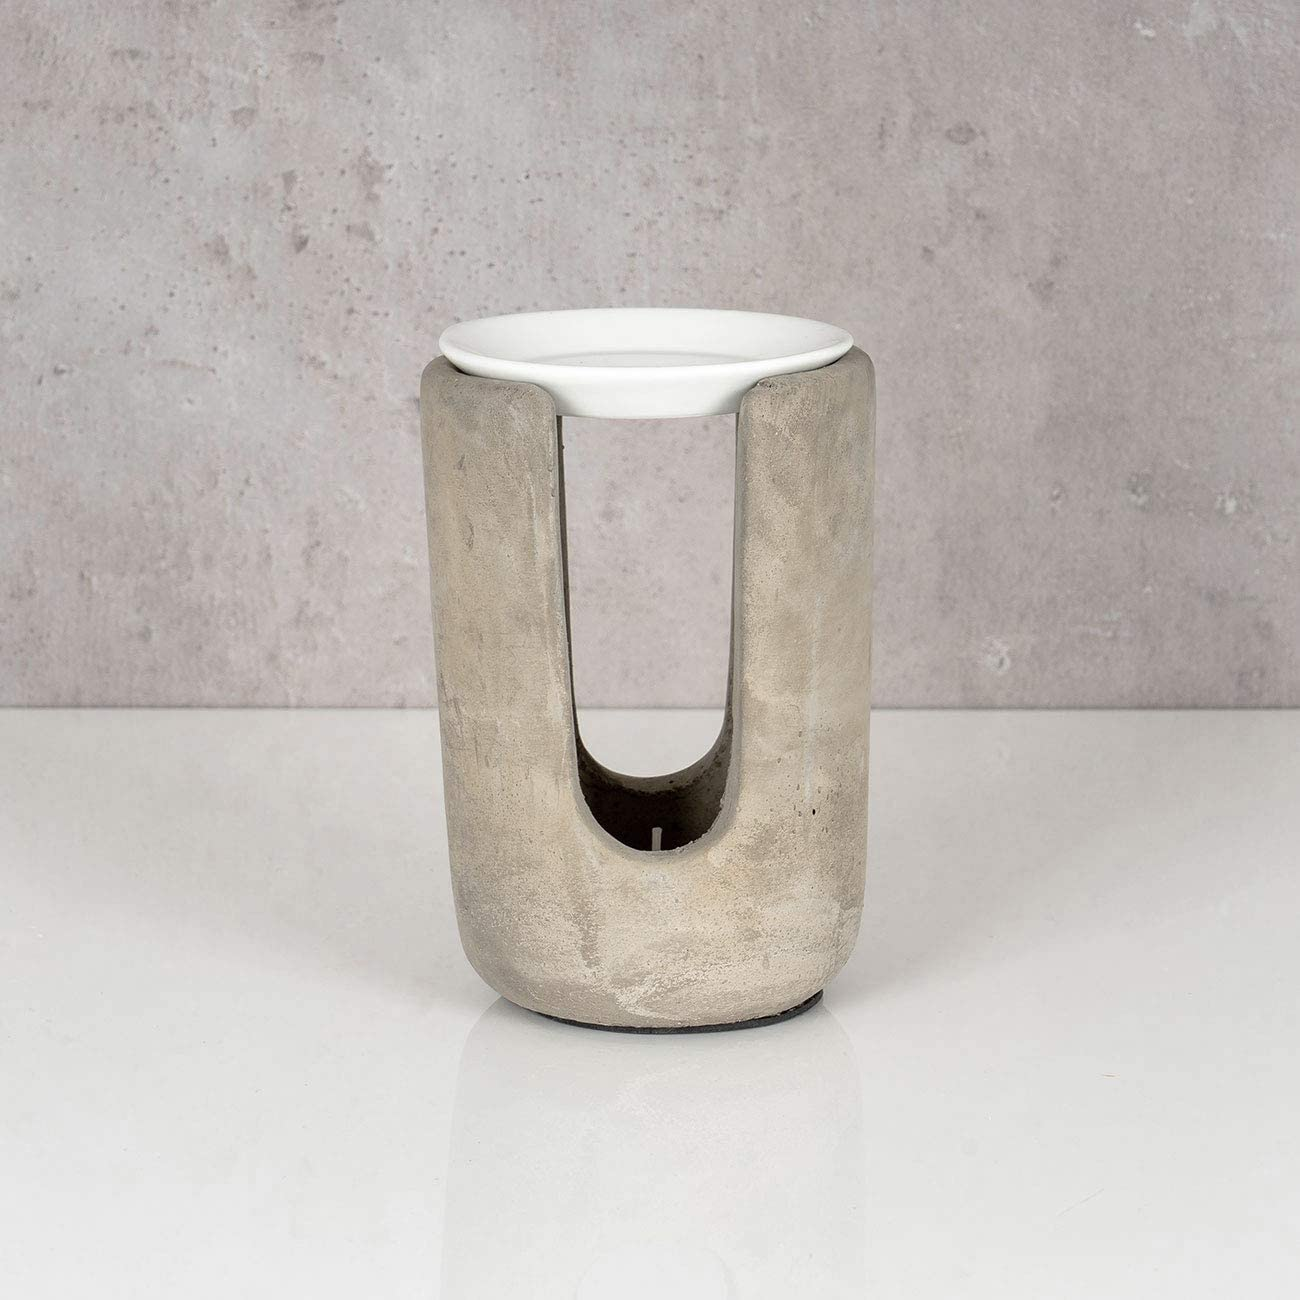 Duftlampe Beton Wei/ß 10x15cm inkl 2X Teelicht Tischdeko Teelichthalter Aroma Aromalampe Raumduft Deko Betondeko